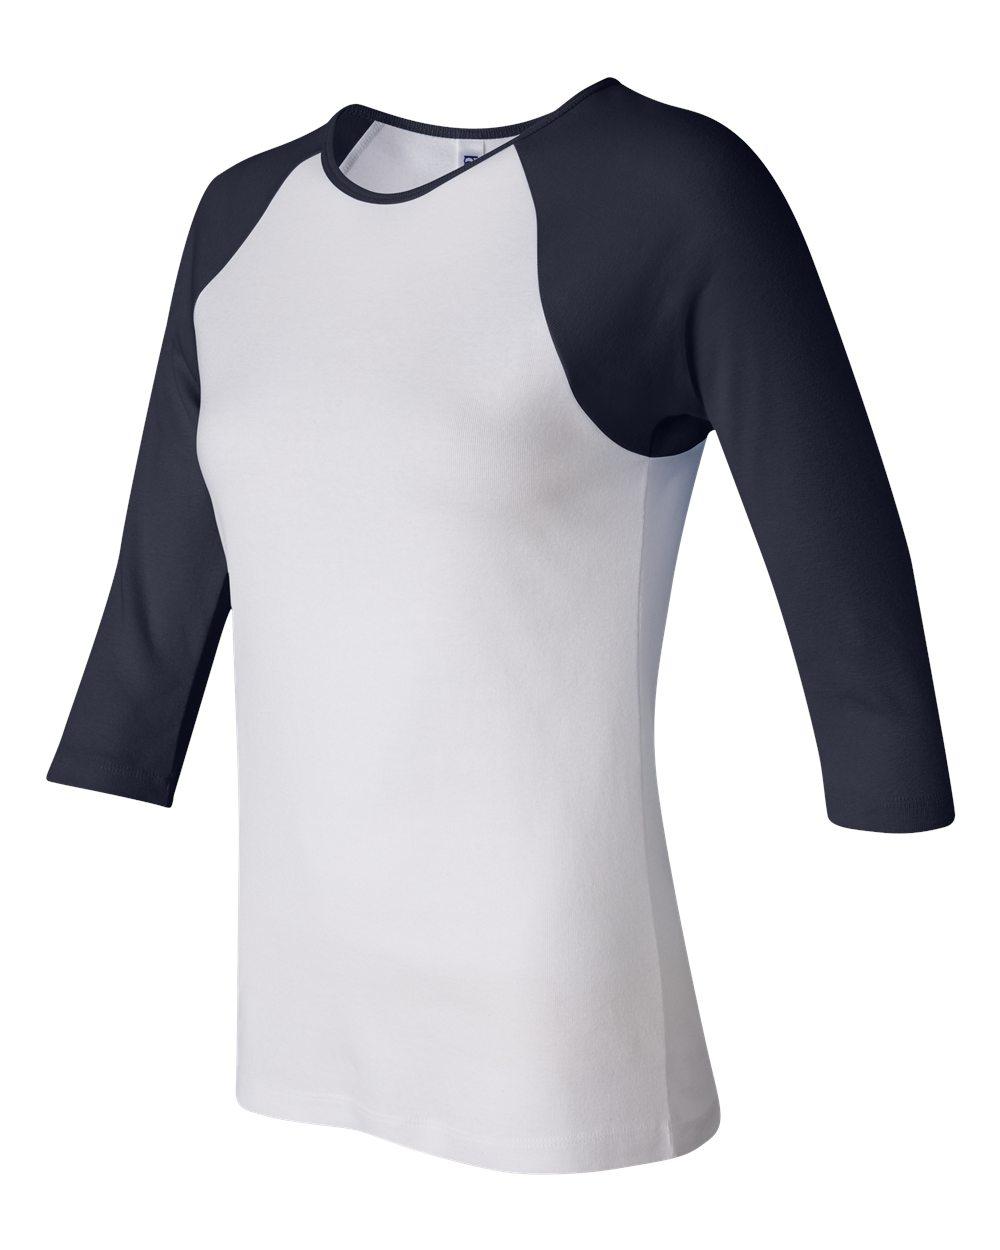 Bella-Canvas-Womens-Stretch-Rib-3-4-Sleeve-Contrast-Raglan-T-Shirt-B2000 thumbnail 19